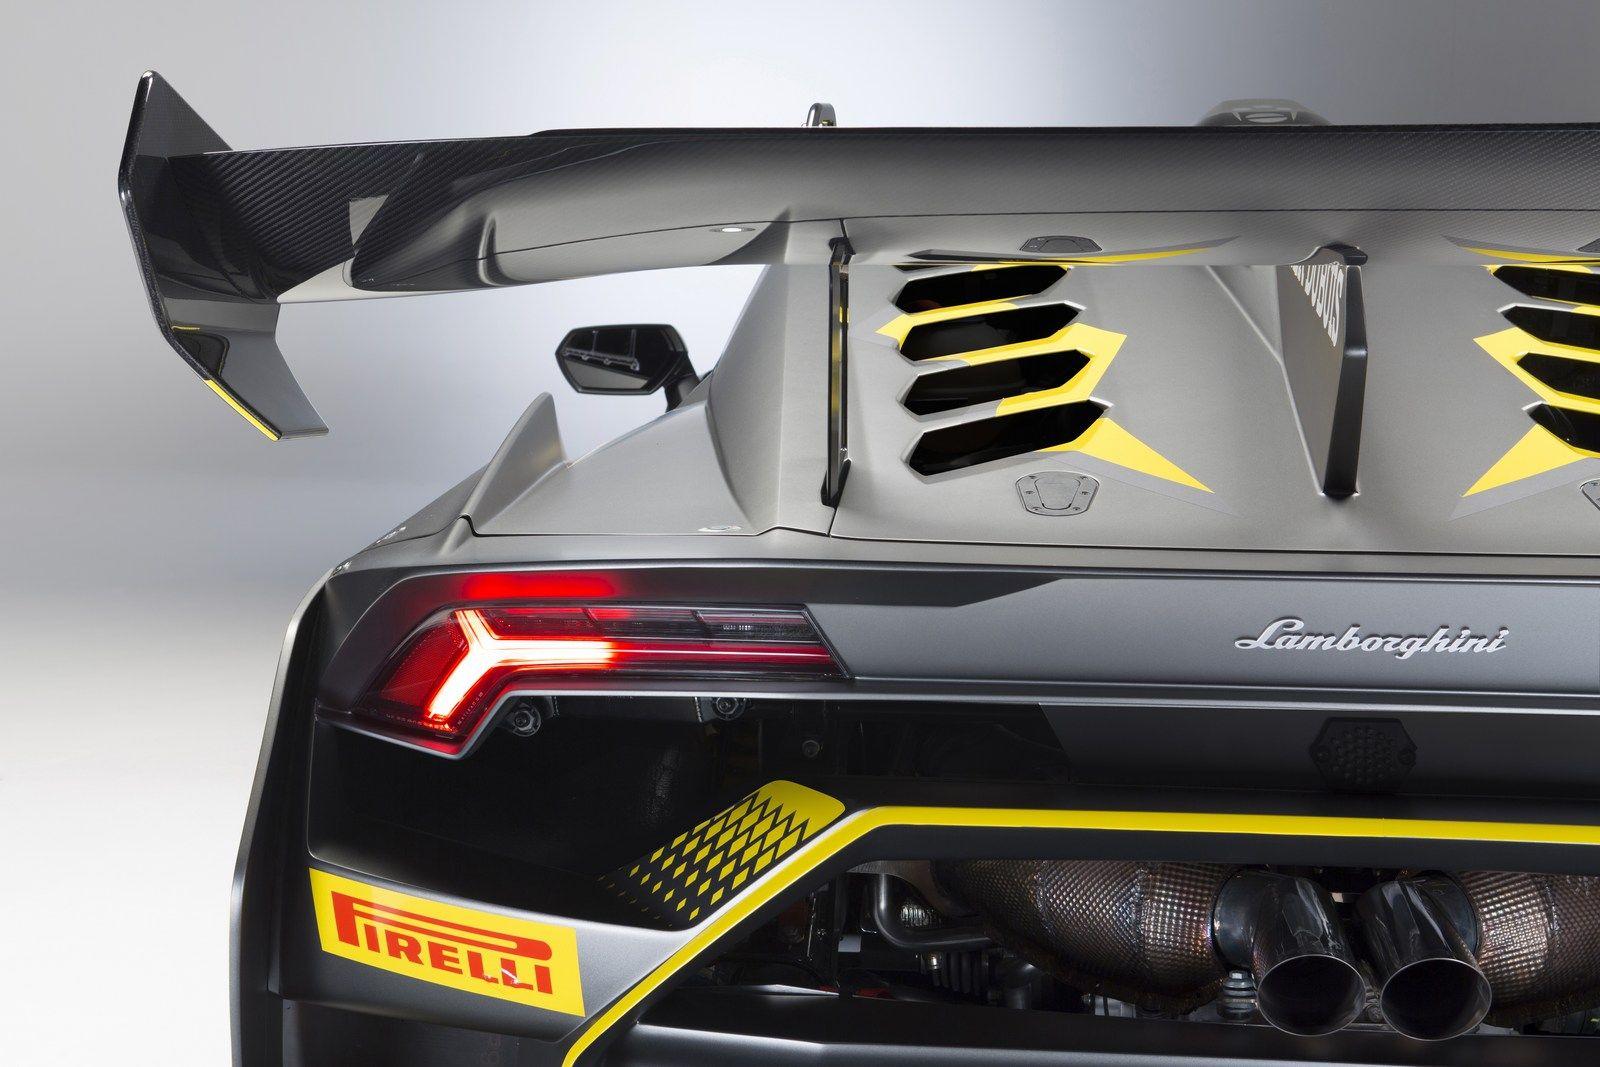 Lamborghini Huracan Super Trofeo Evo Unveiled With Improved Aerodynamics Carscoops Lamborghini Huracan Lamborghini Cool Sports Cars